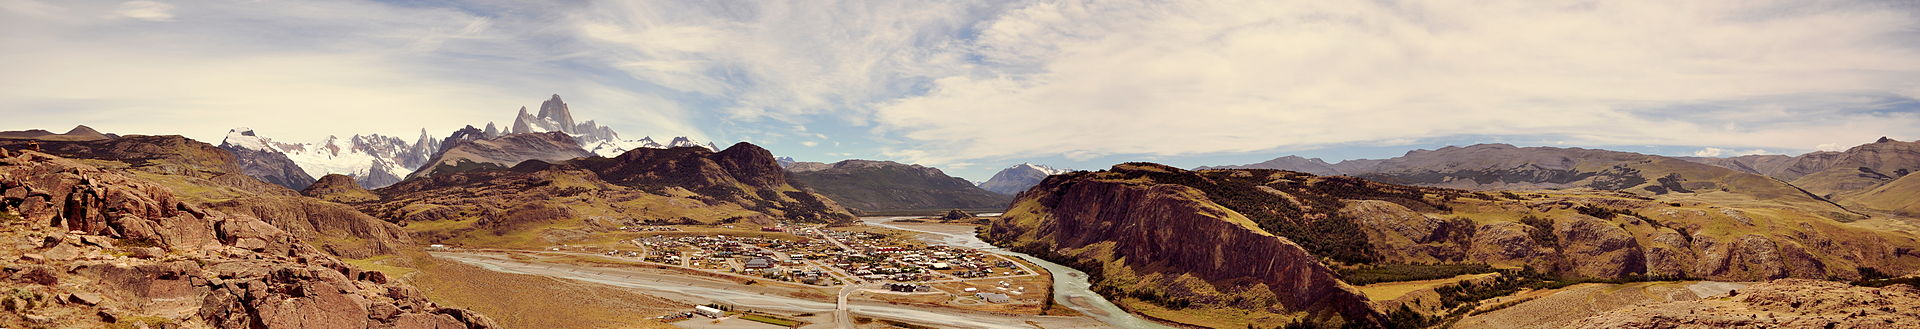 Panoramic view of El Chaltén